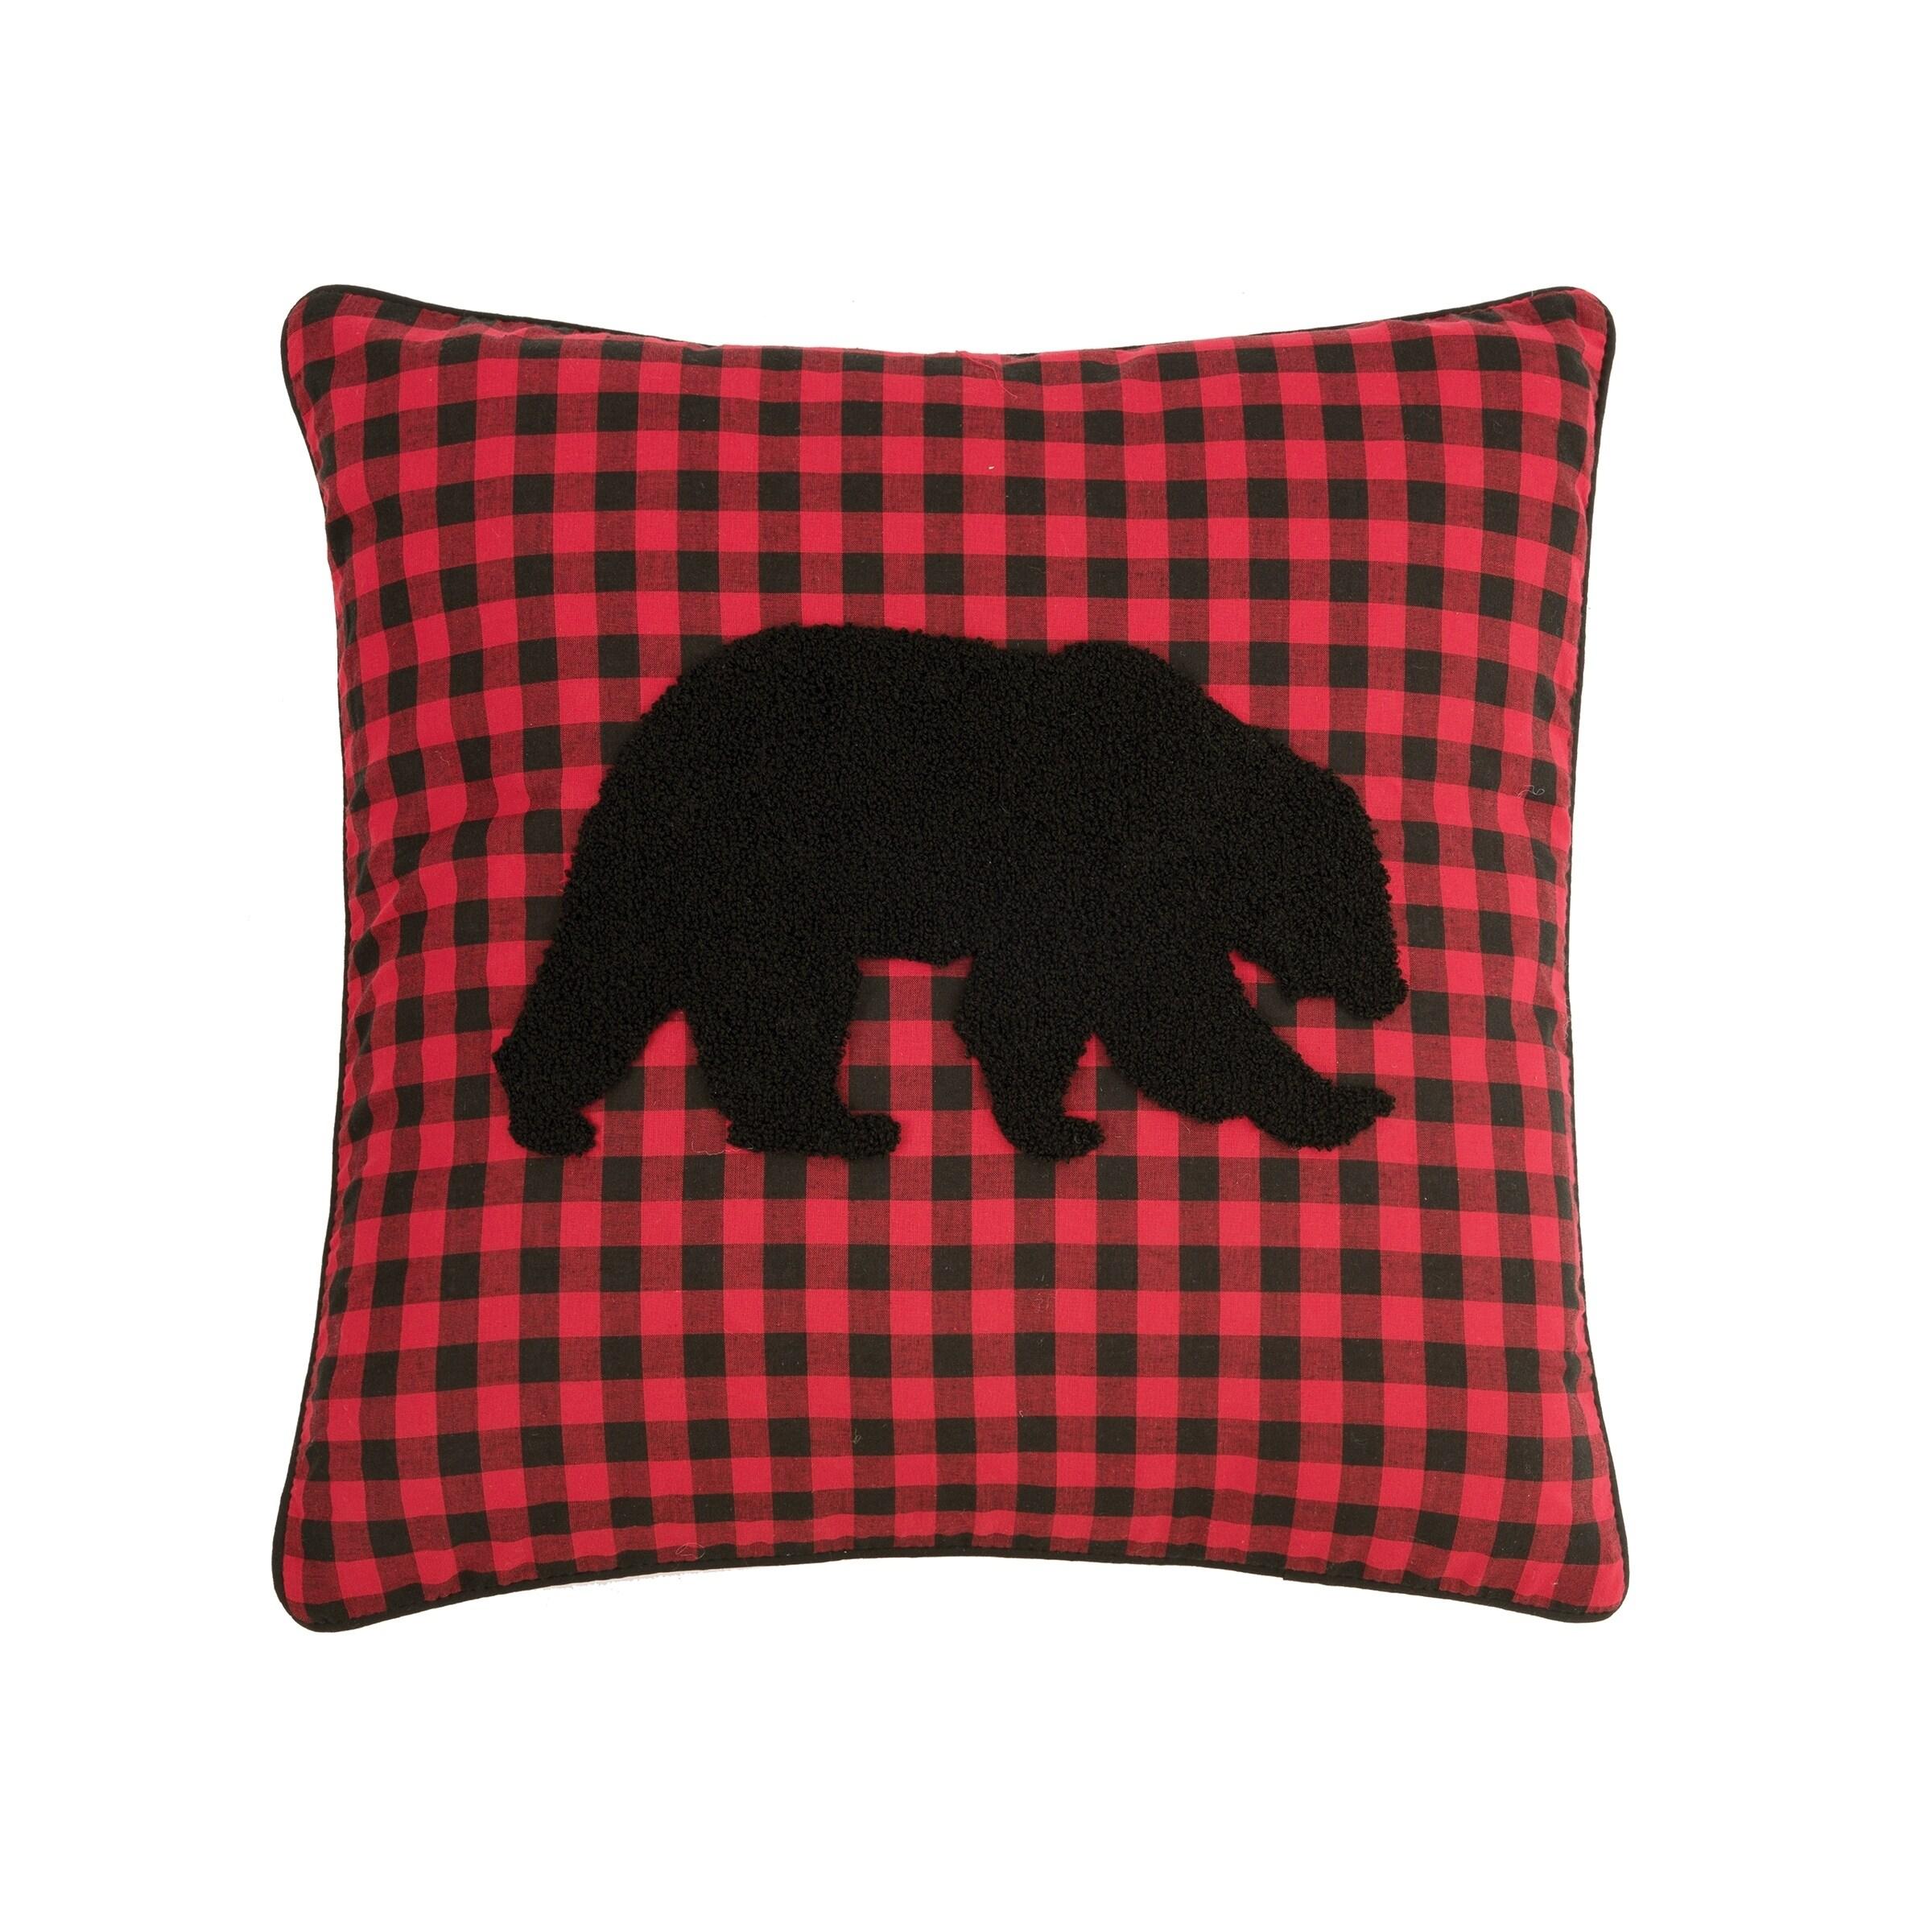 Woodford 18 x 18 Pillow (Bear)